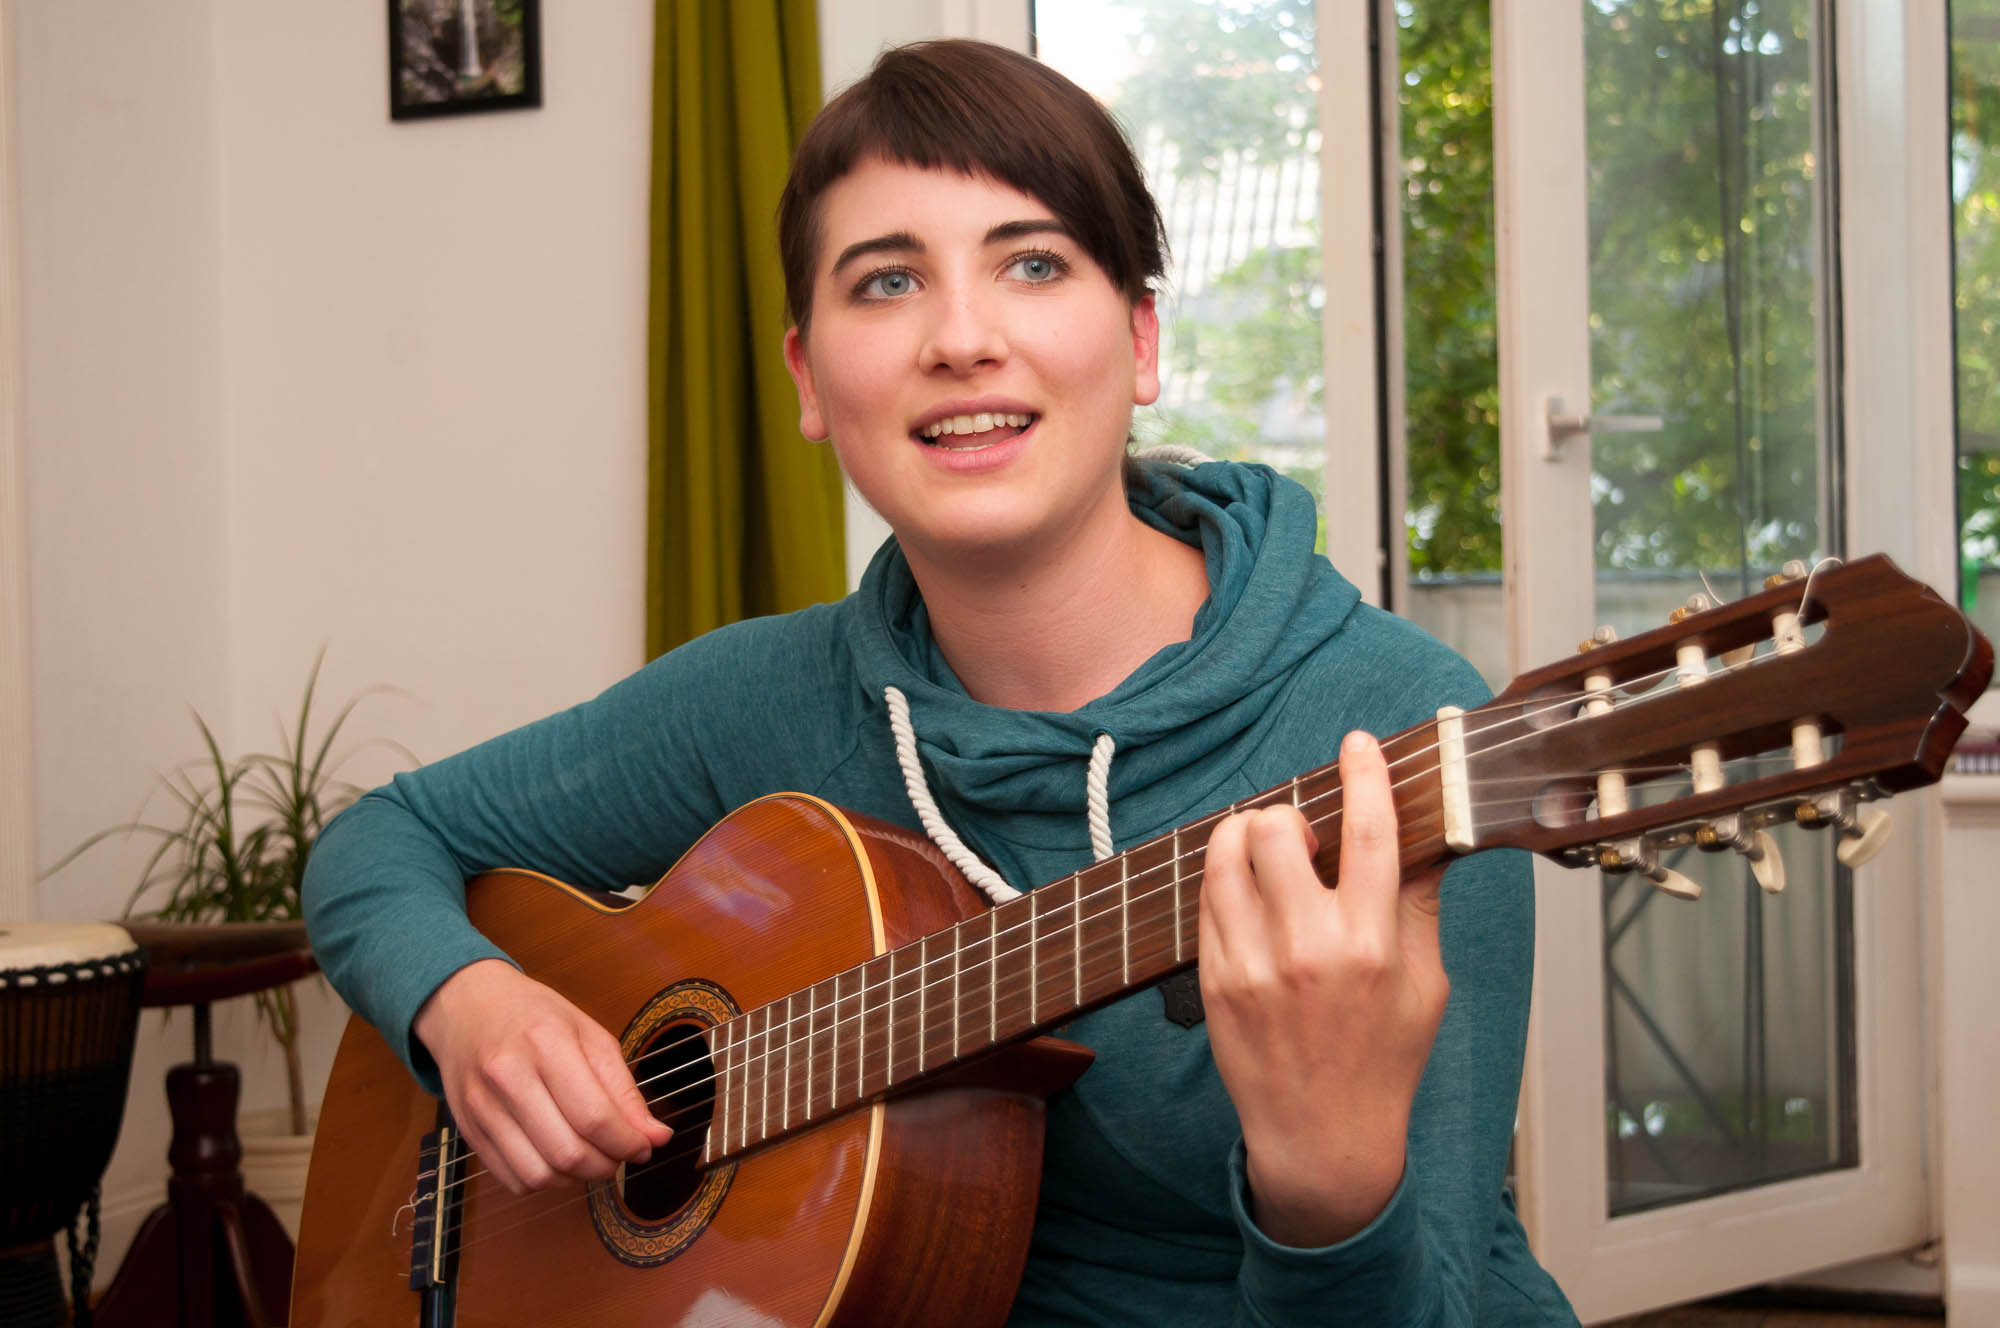 musiktherapie ausbildung hamburg